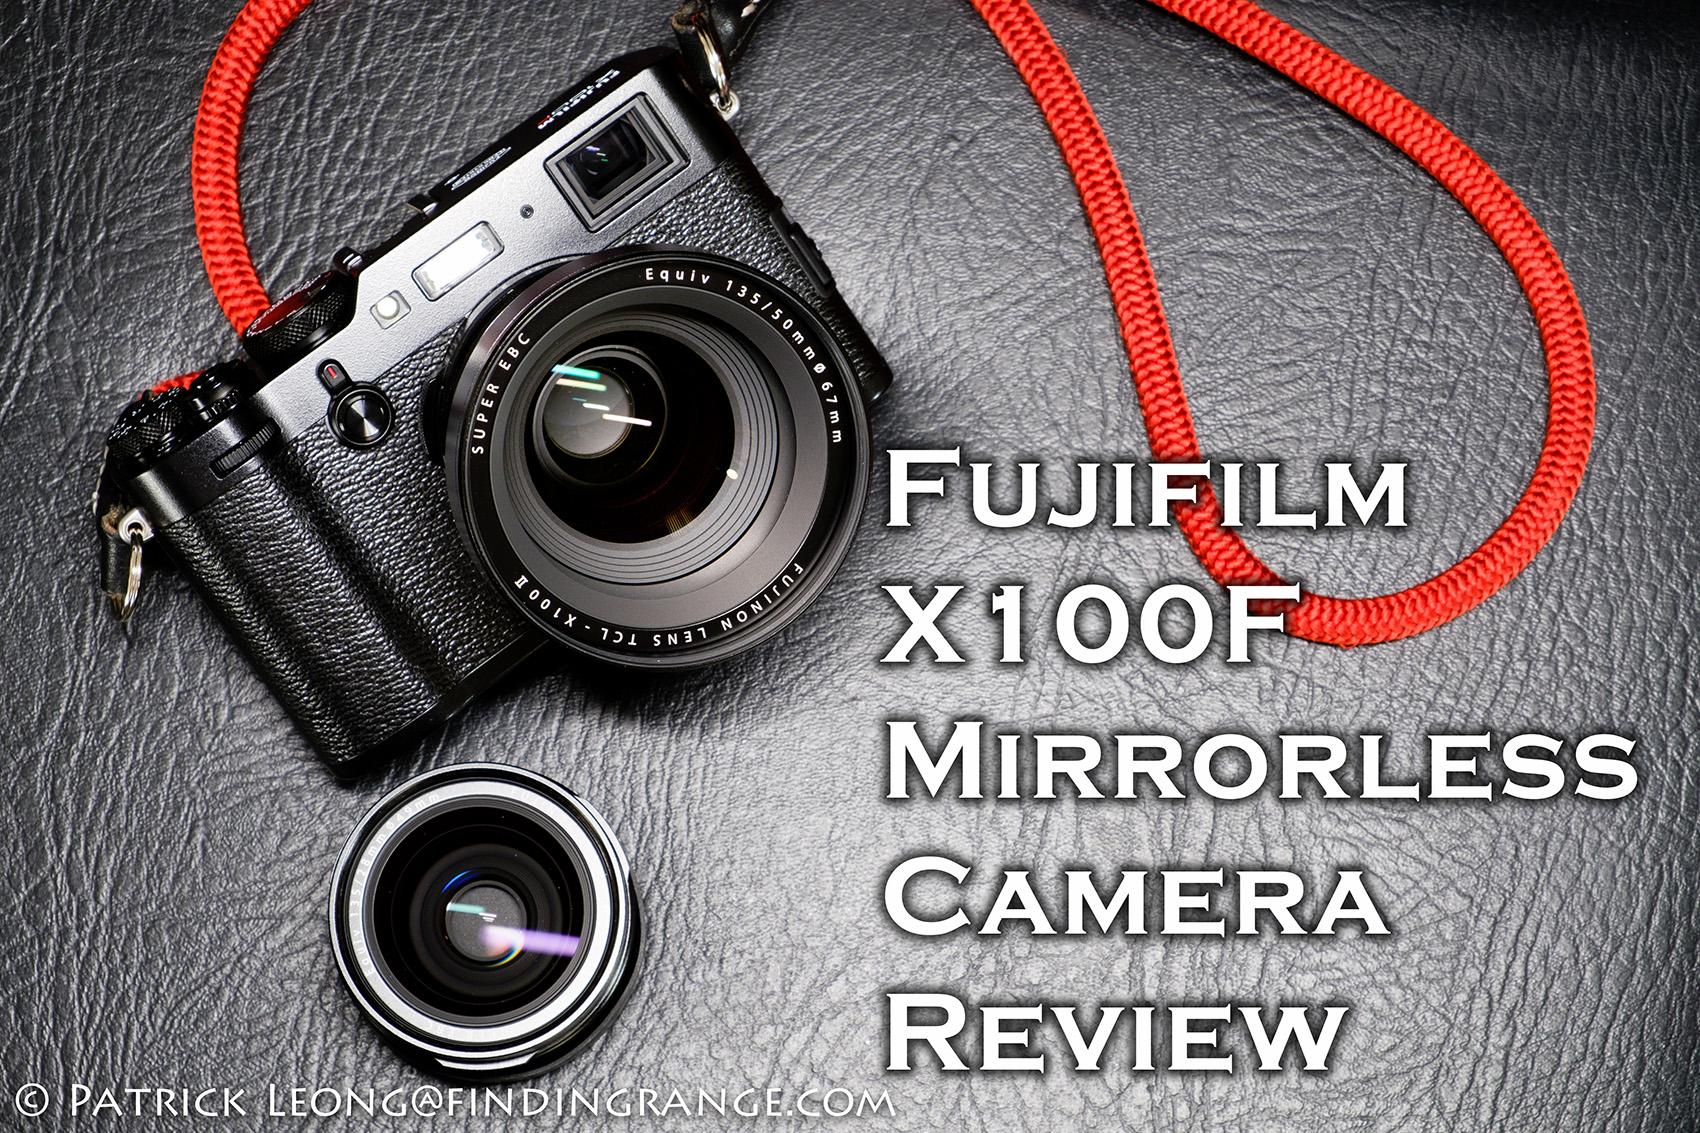 Fujifilm X100F Mirrorless Camera Review